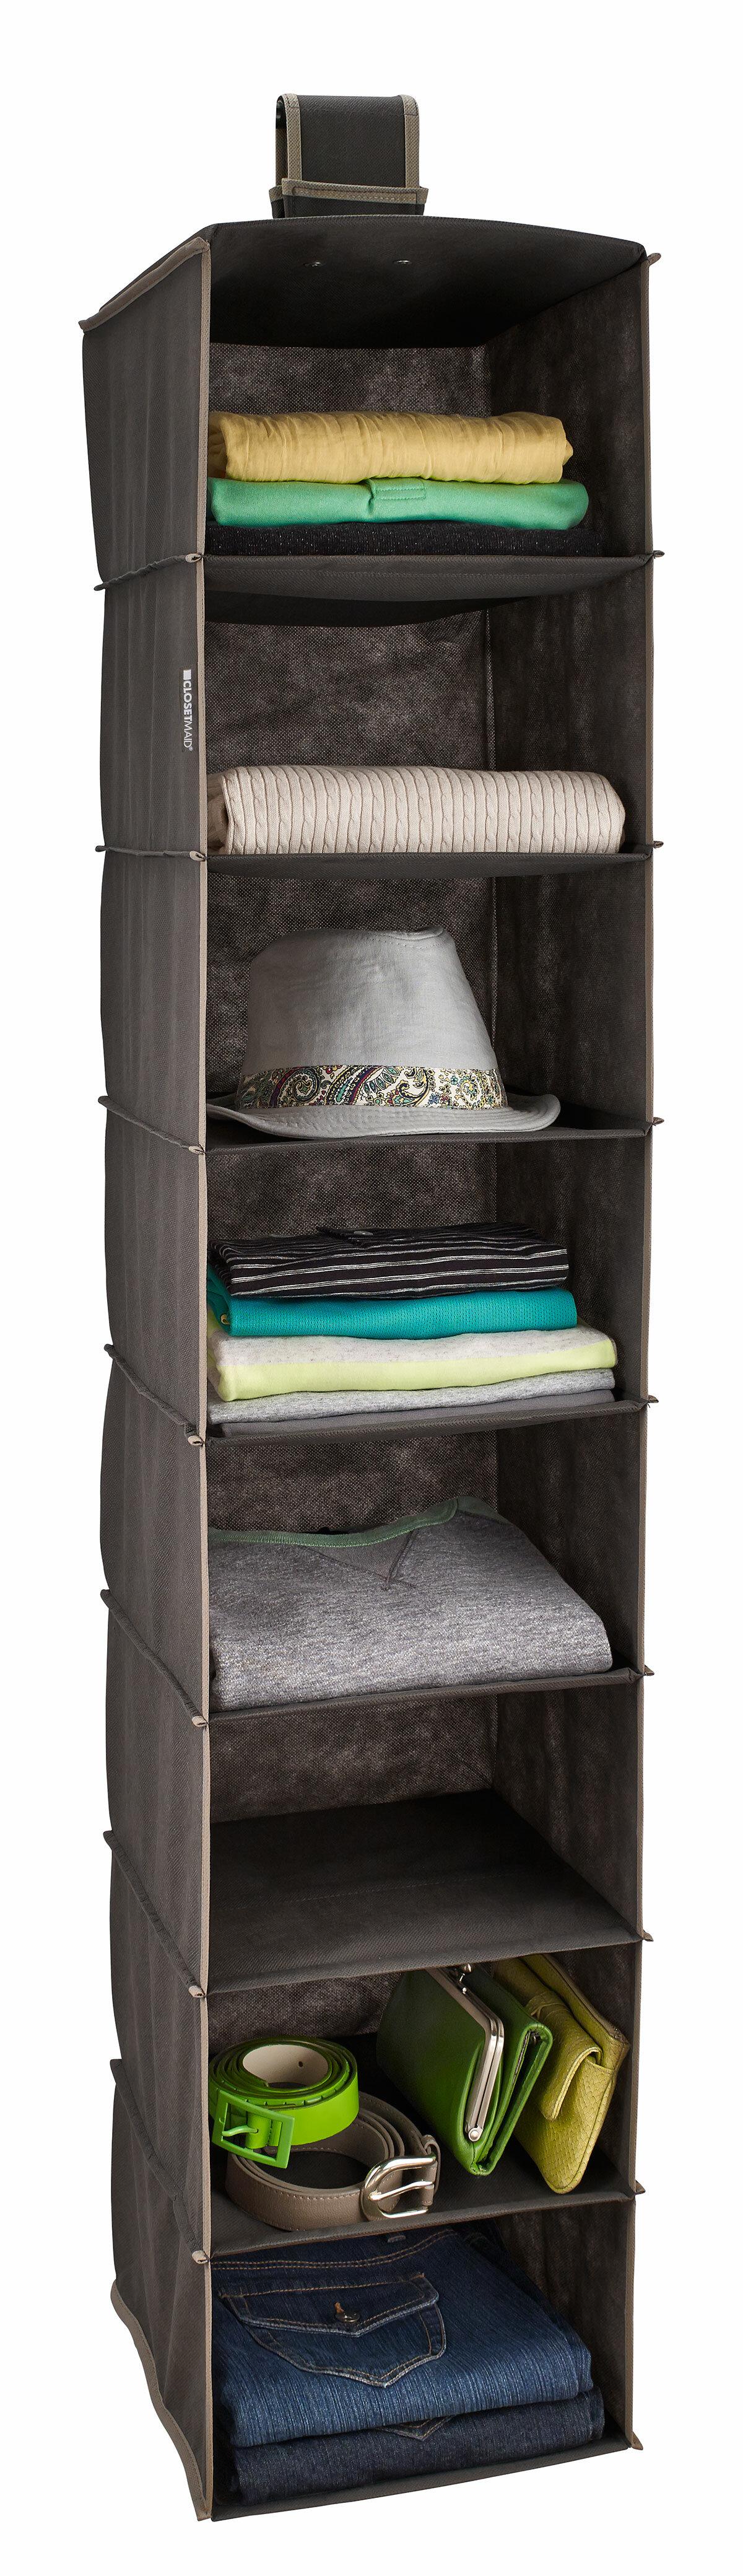 ClosetMaid 8 Shelf Closet Hanging Organizer U0026 Reviews   Wayfair